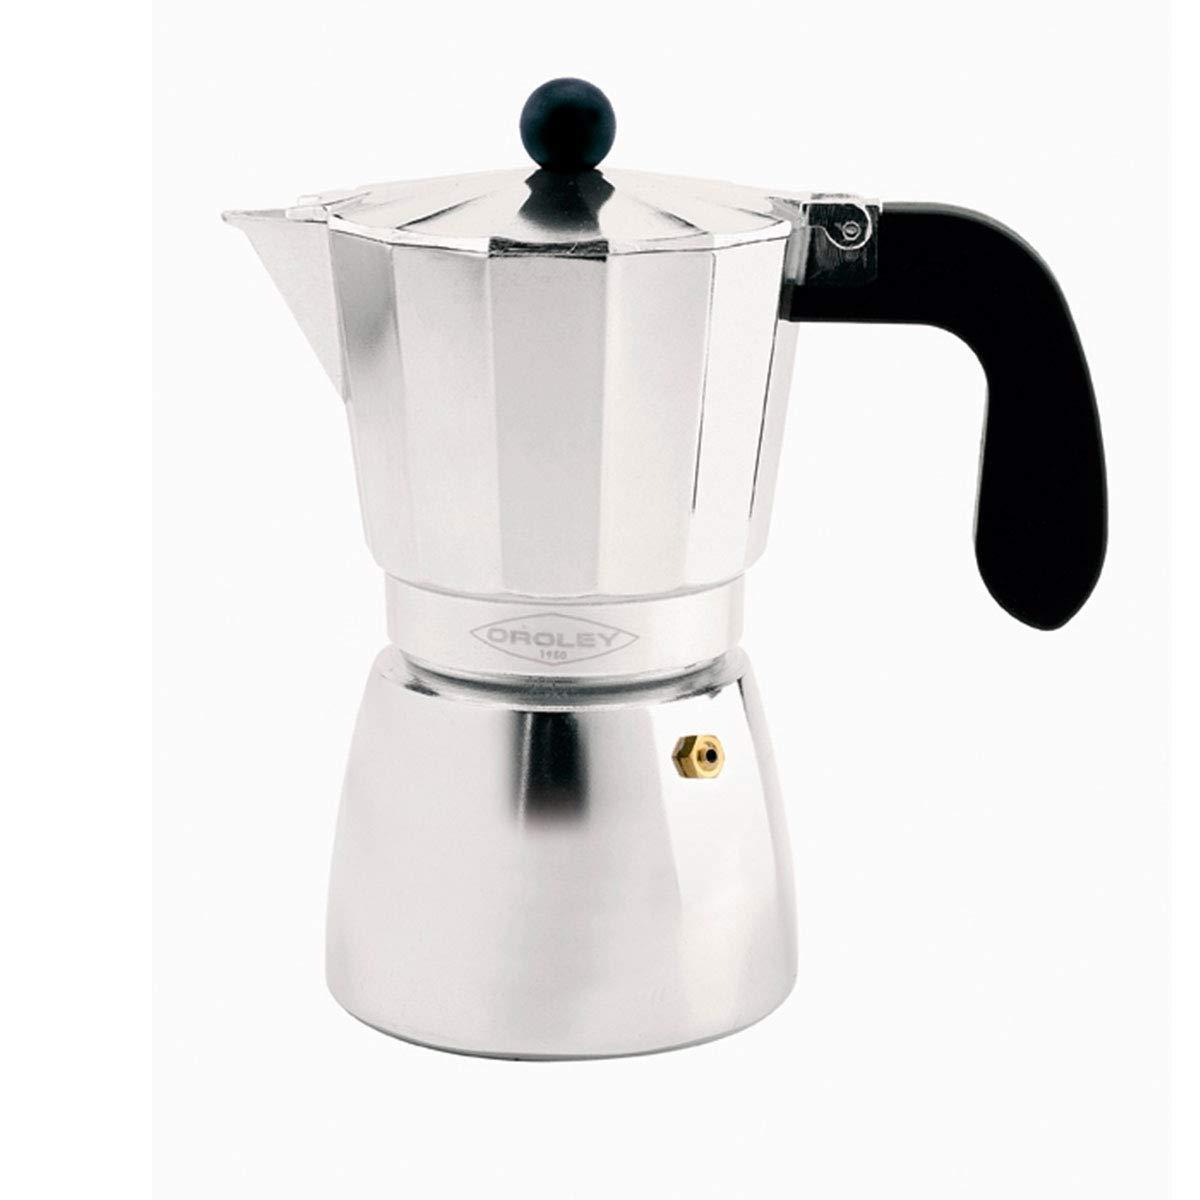 Oroley - Cafetera Italiana Alu de Aluminio, 12 Tazas: Amazon.es: Hogar